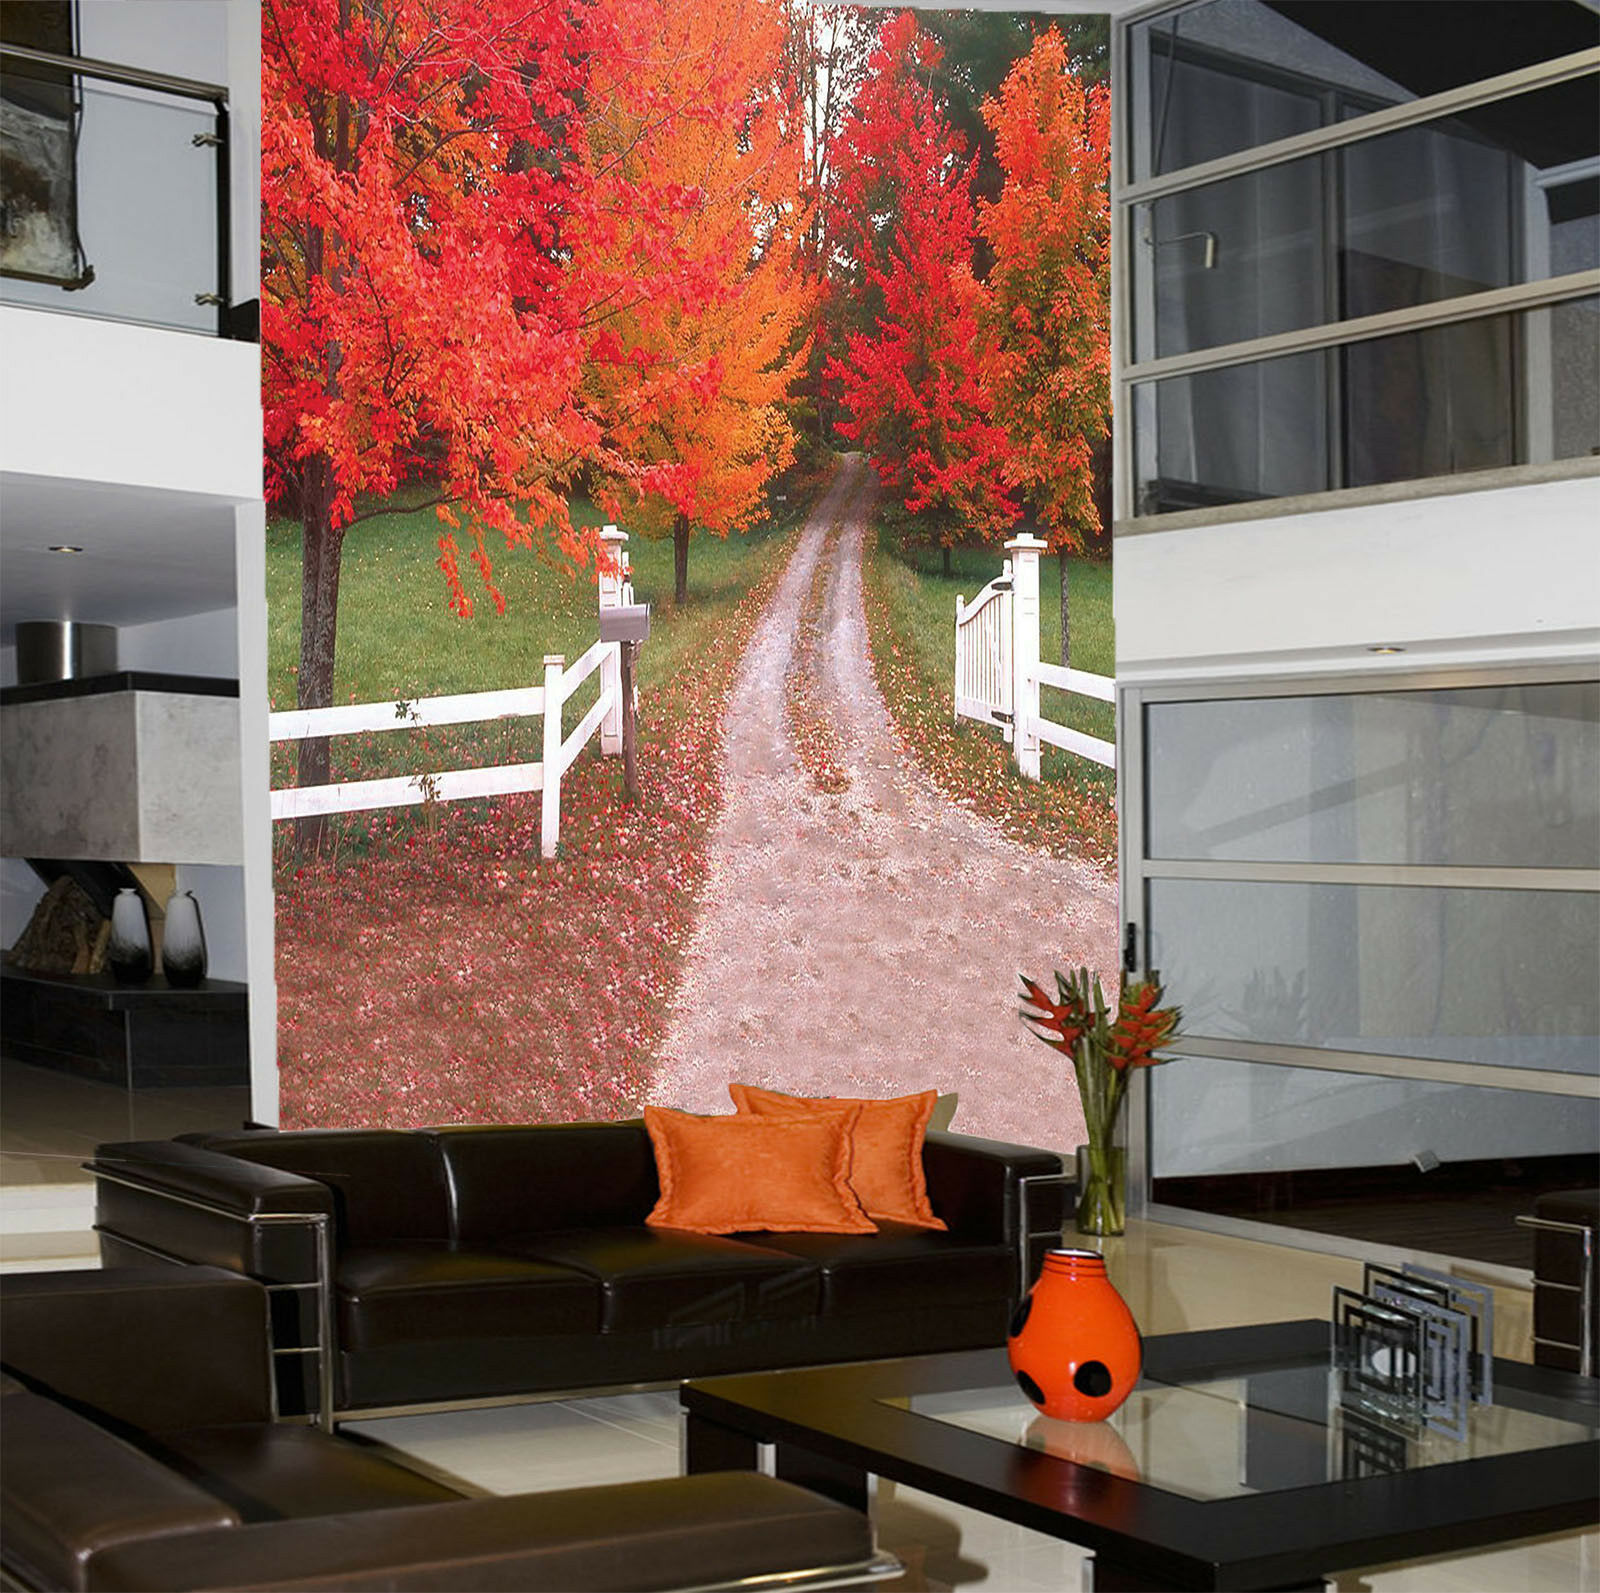 3D Roter Ahorn Park 975 Tapete Wandgemälde Tapete Tapeten Bild Familie DE Summer | Verrückter Preis, Birmingham  | Haltbarer Service  | Mangelware